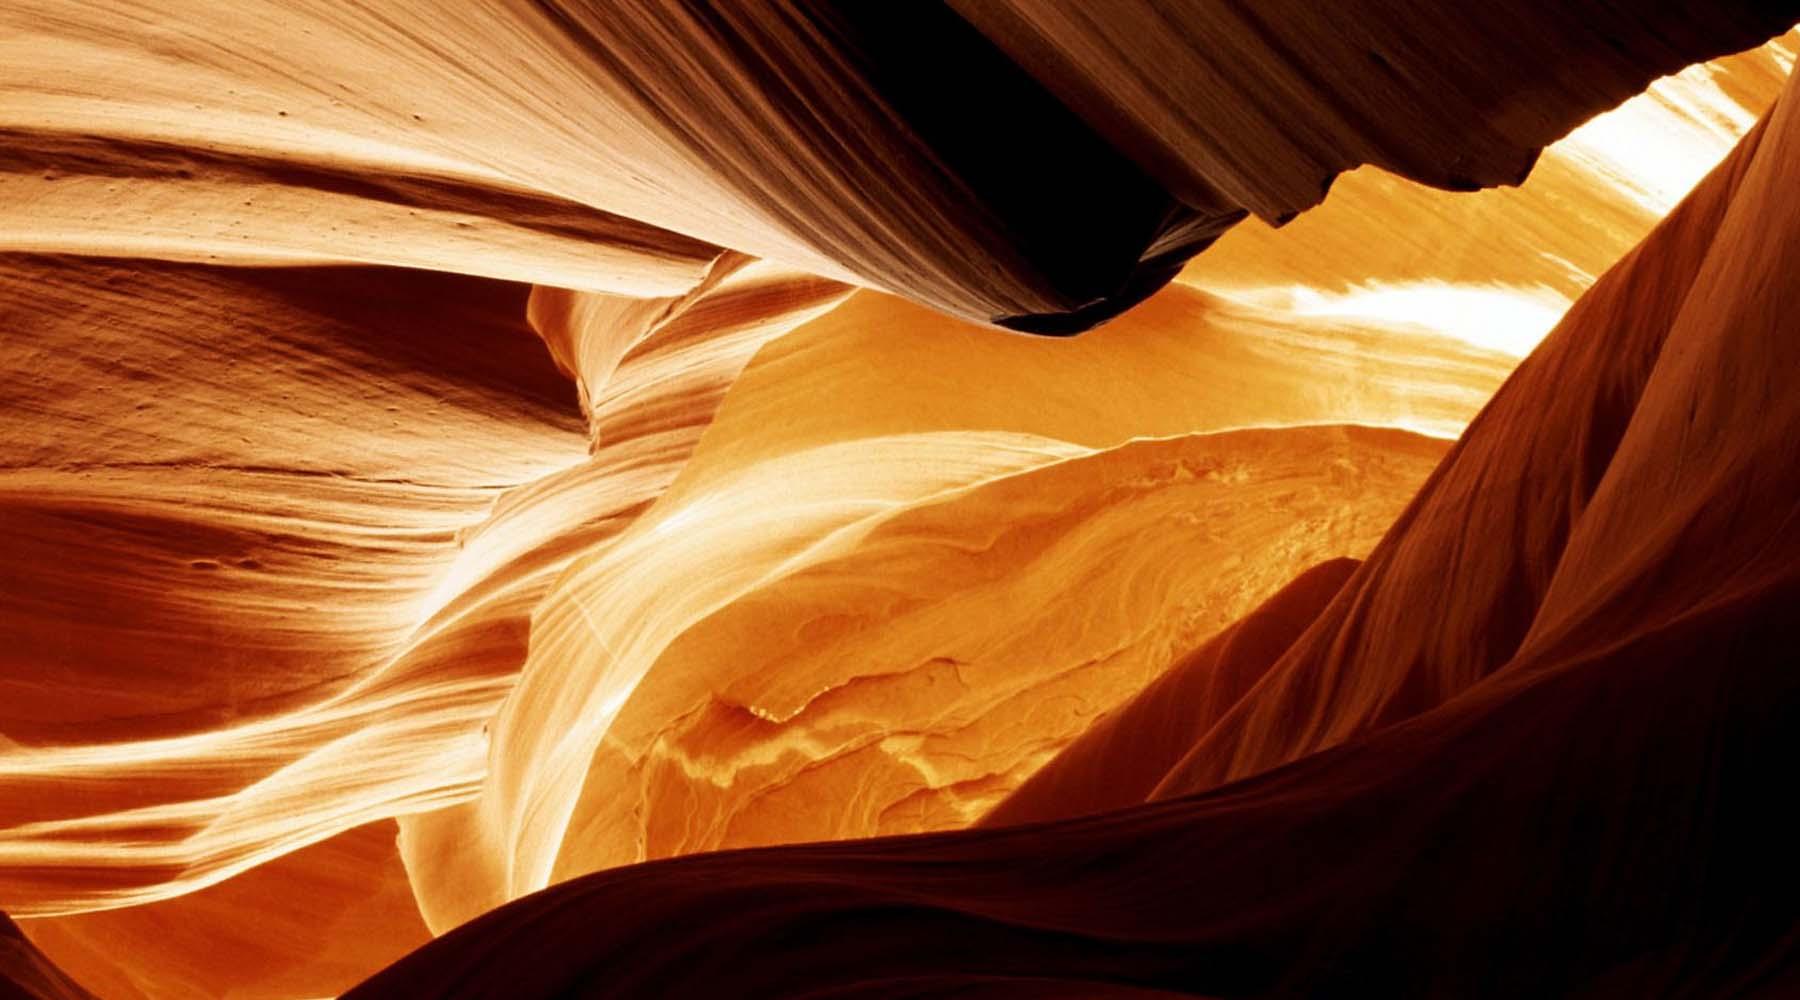 voyage, chinook, zion, grand canyon, chinook, bryce canyon, voyage, travel, trek, randonnee, paria canyon, las vegas, roche